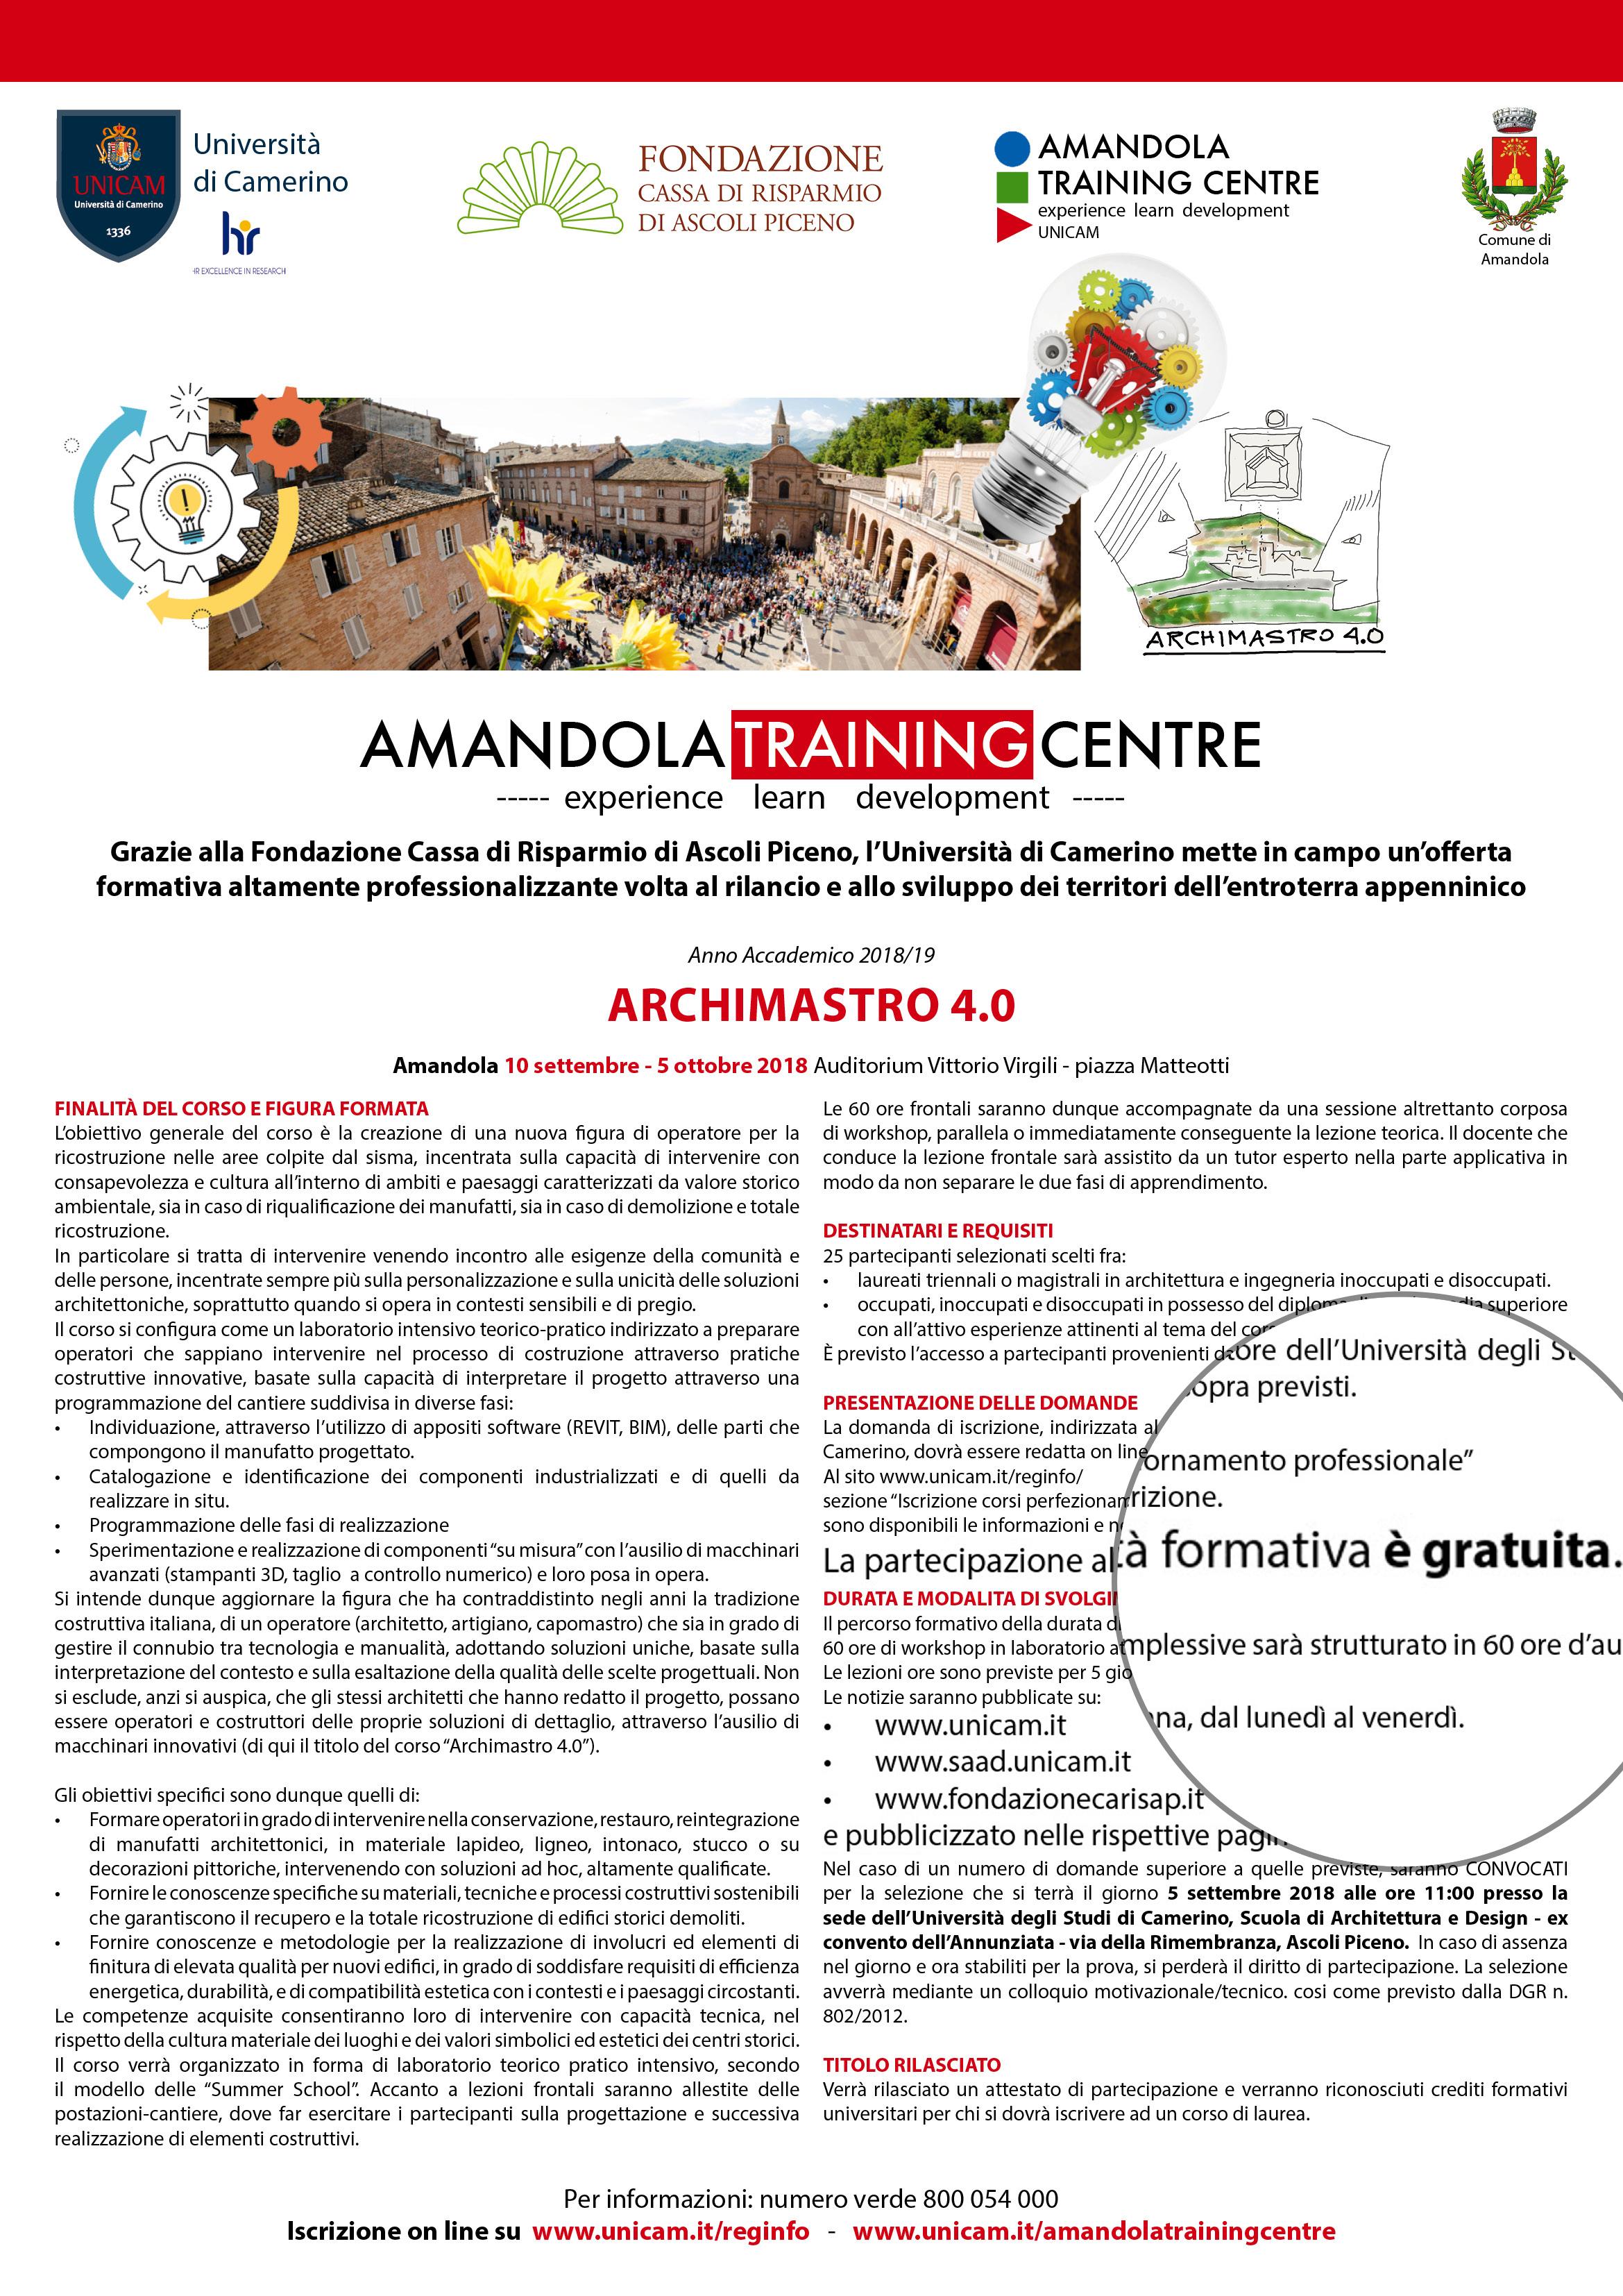 Unicam Calendario Didattico.Archimastro 4 0 Amandola Training Centre Scuola Di